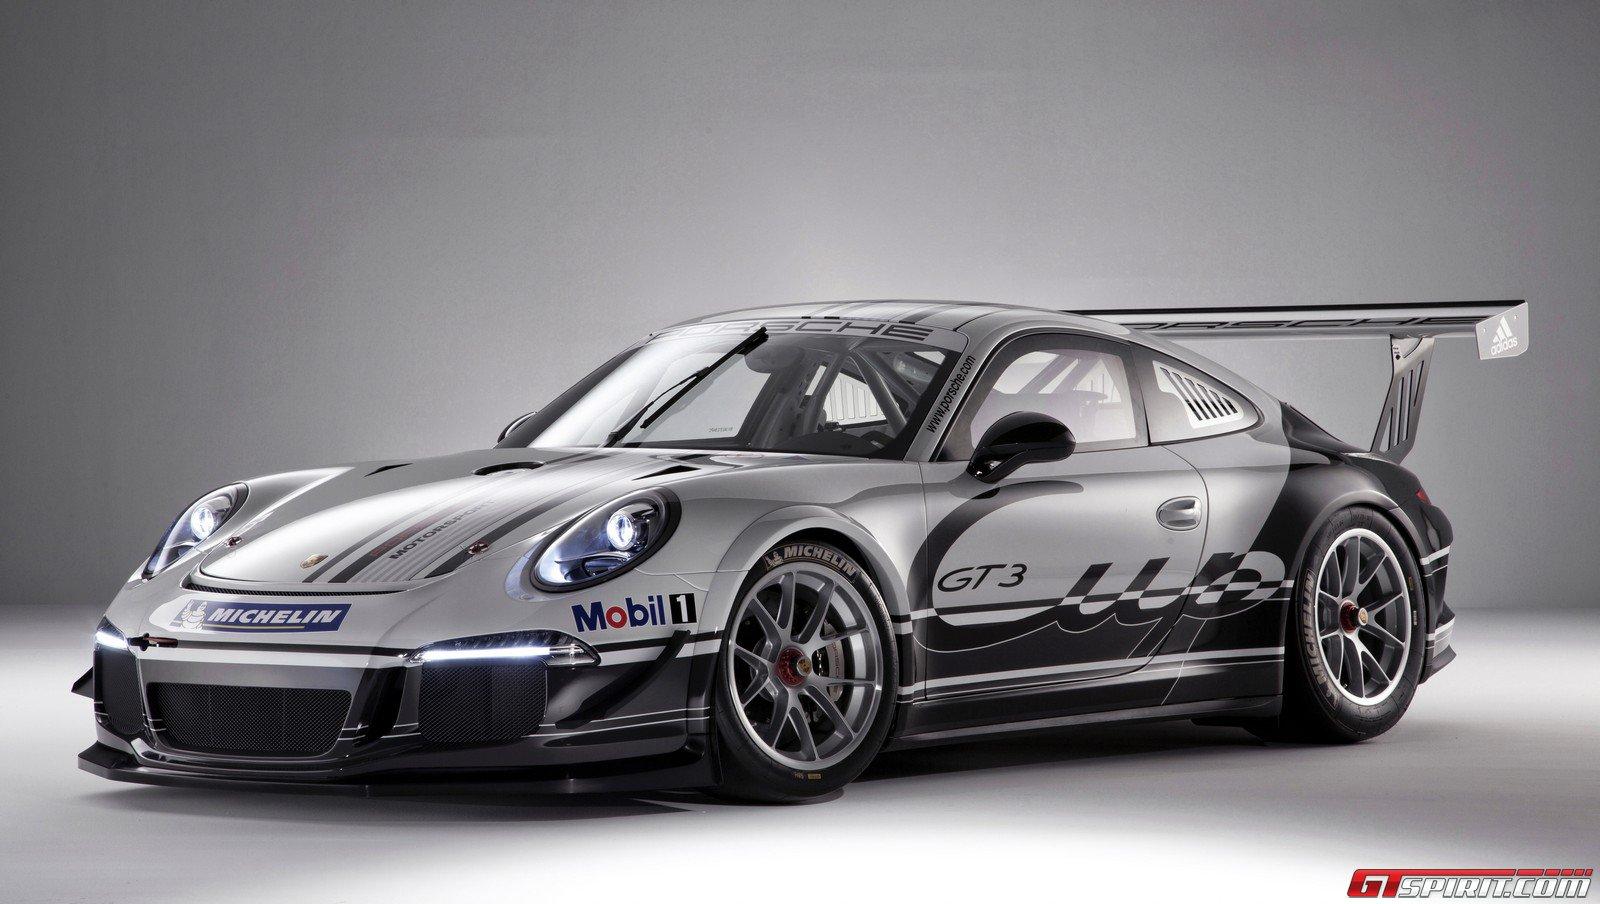 2013 Porsche 911 GT3 Cup Photo 2